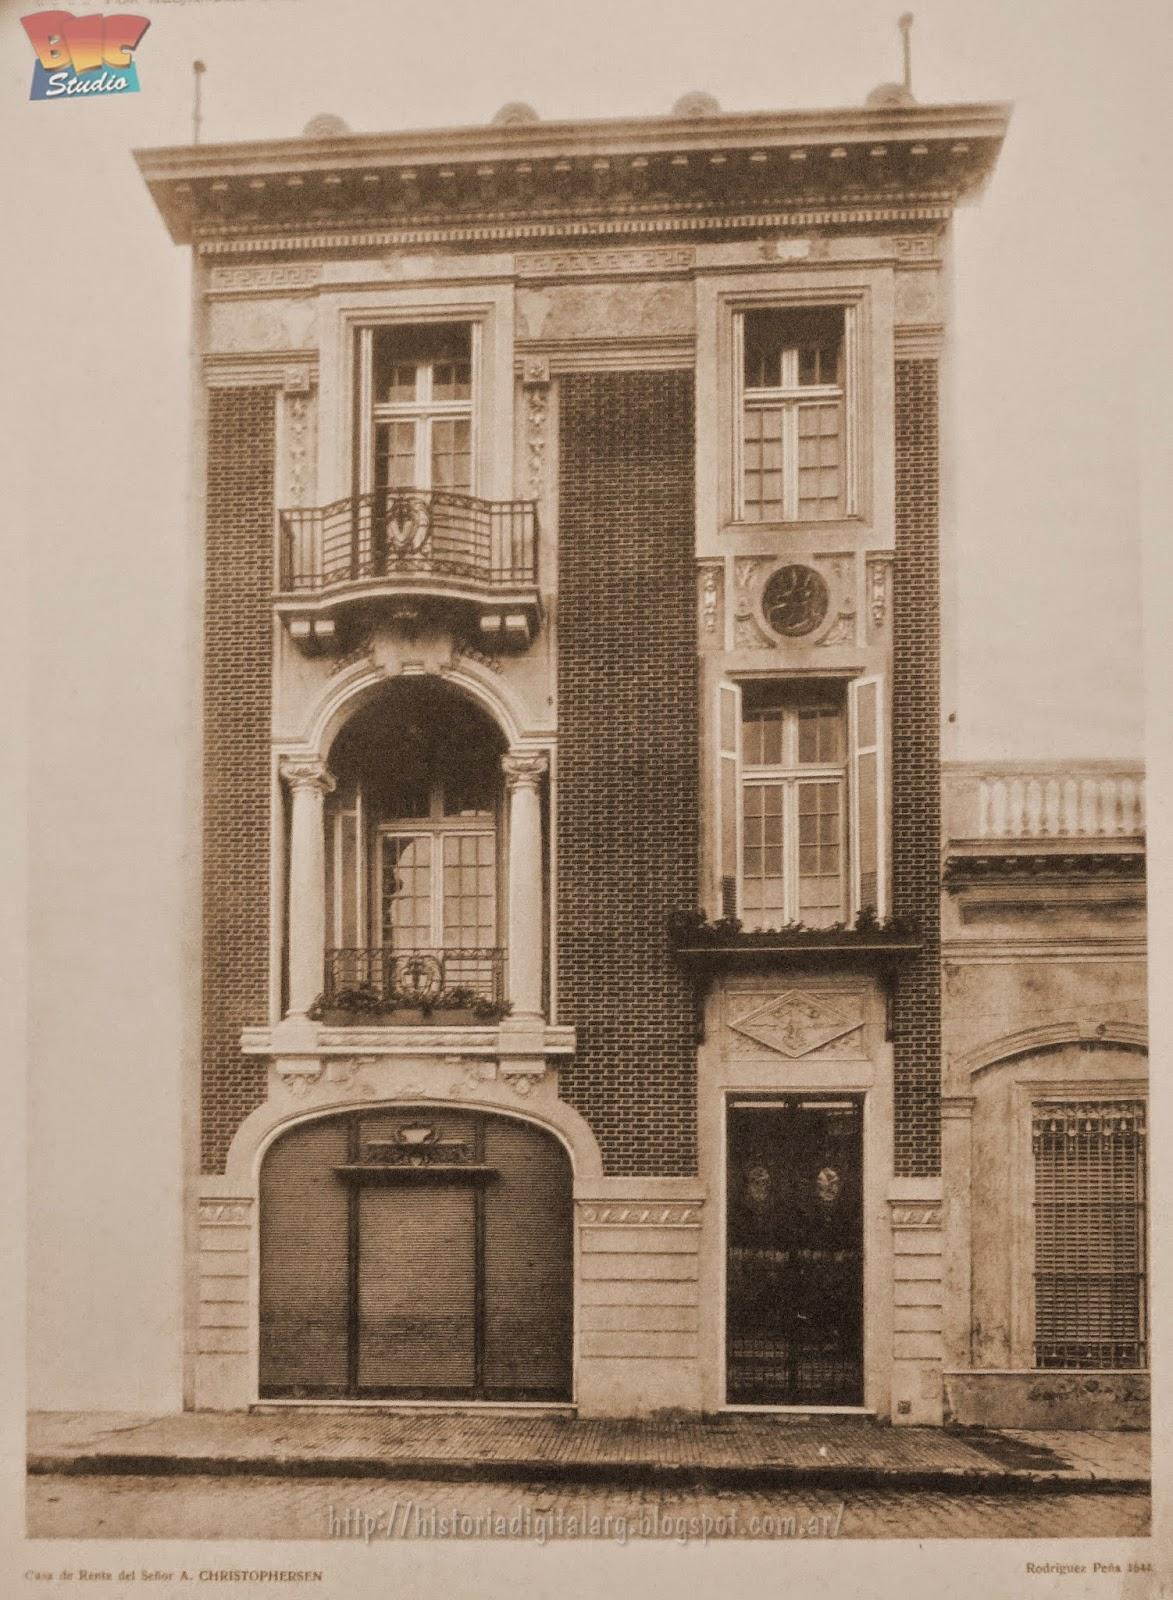 historia digital enciclopedia fotogr fica calle On hoteles en calle rodriguez pena buenos aires